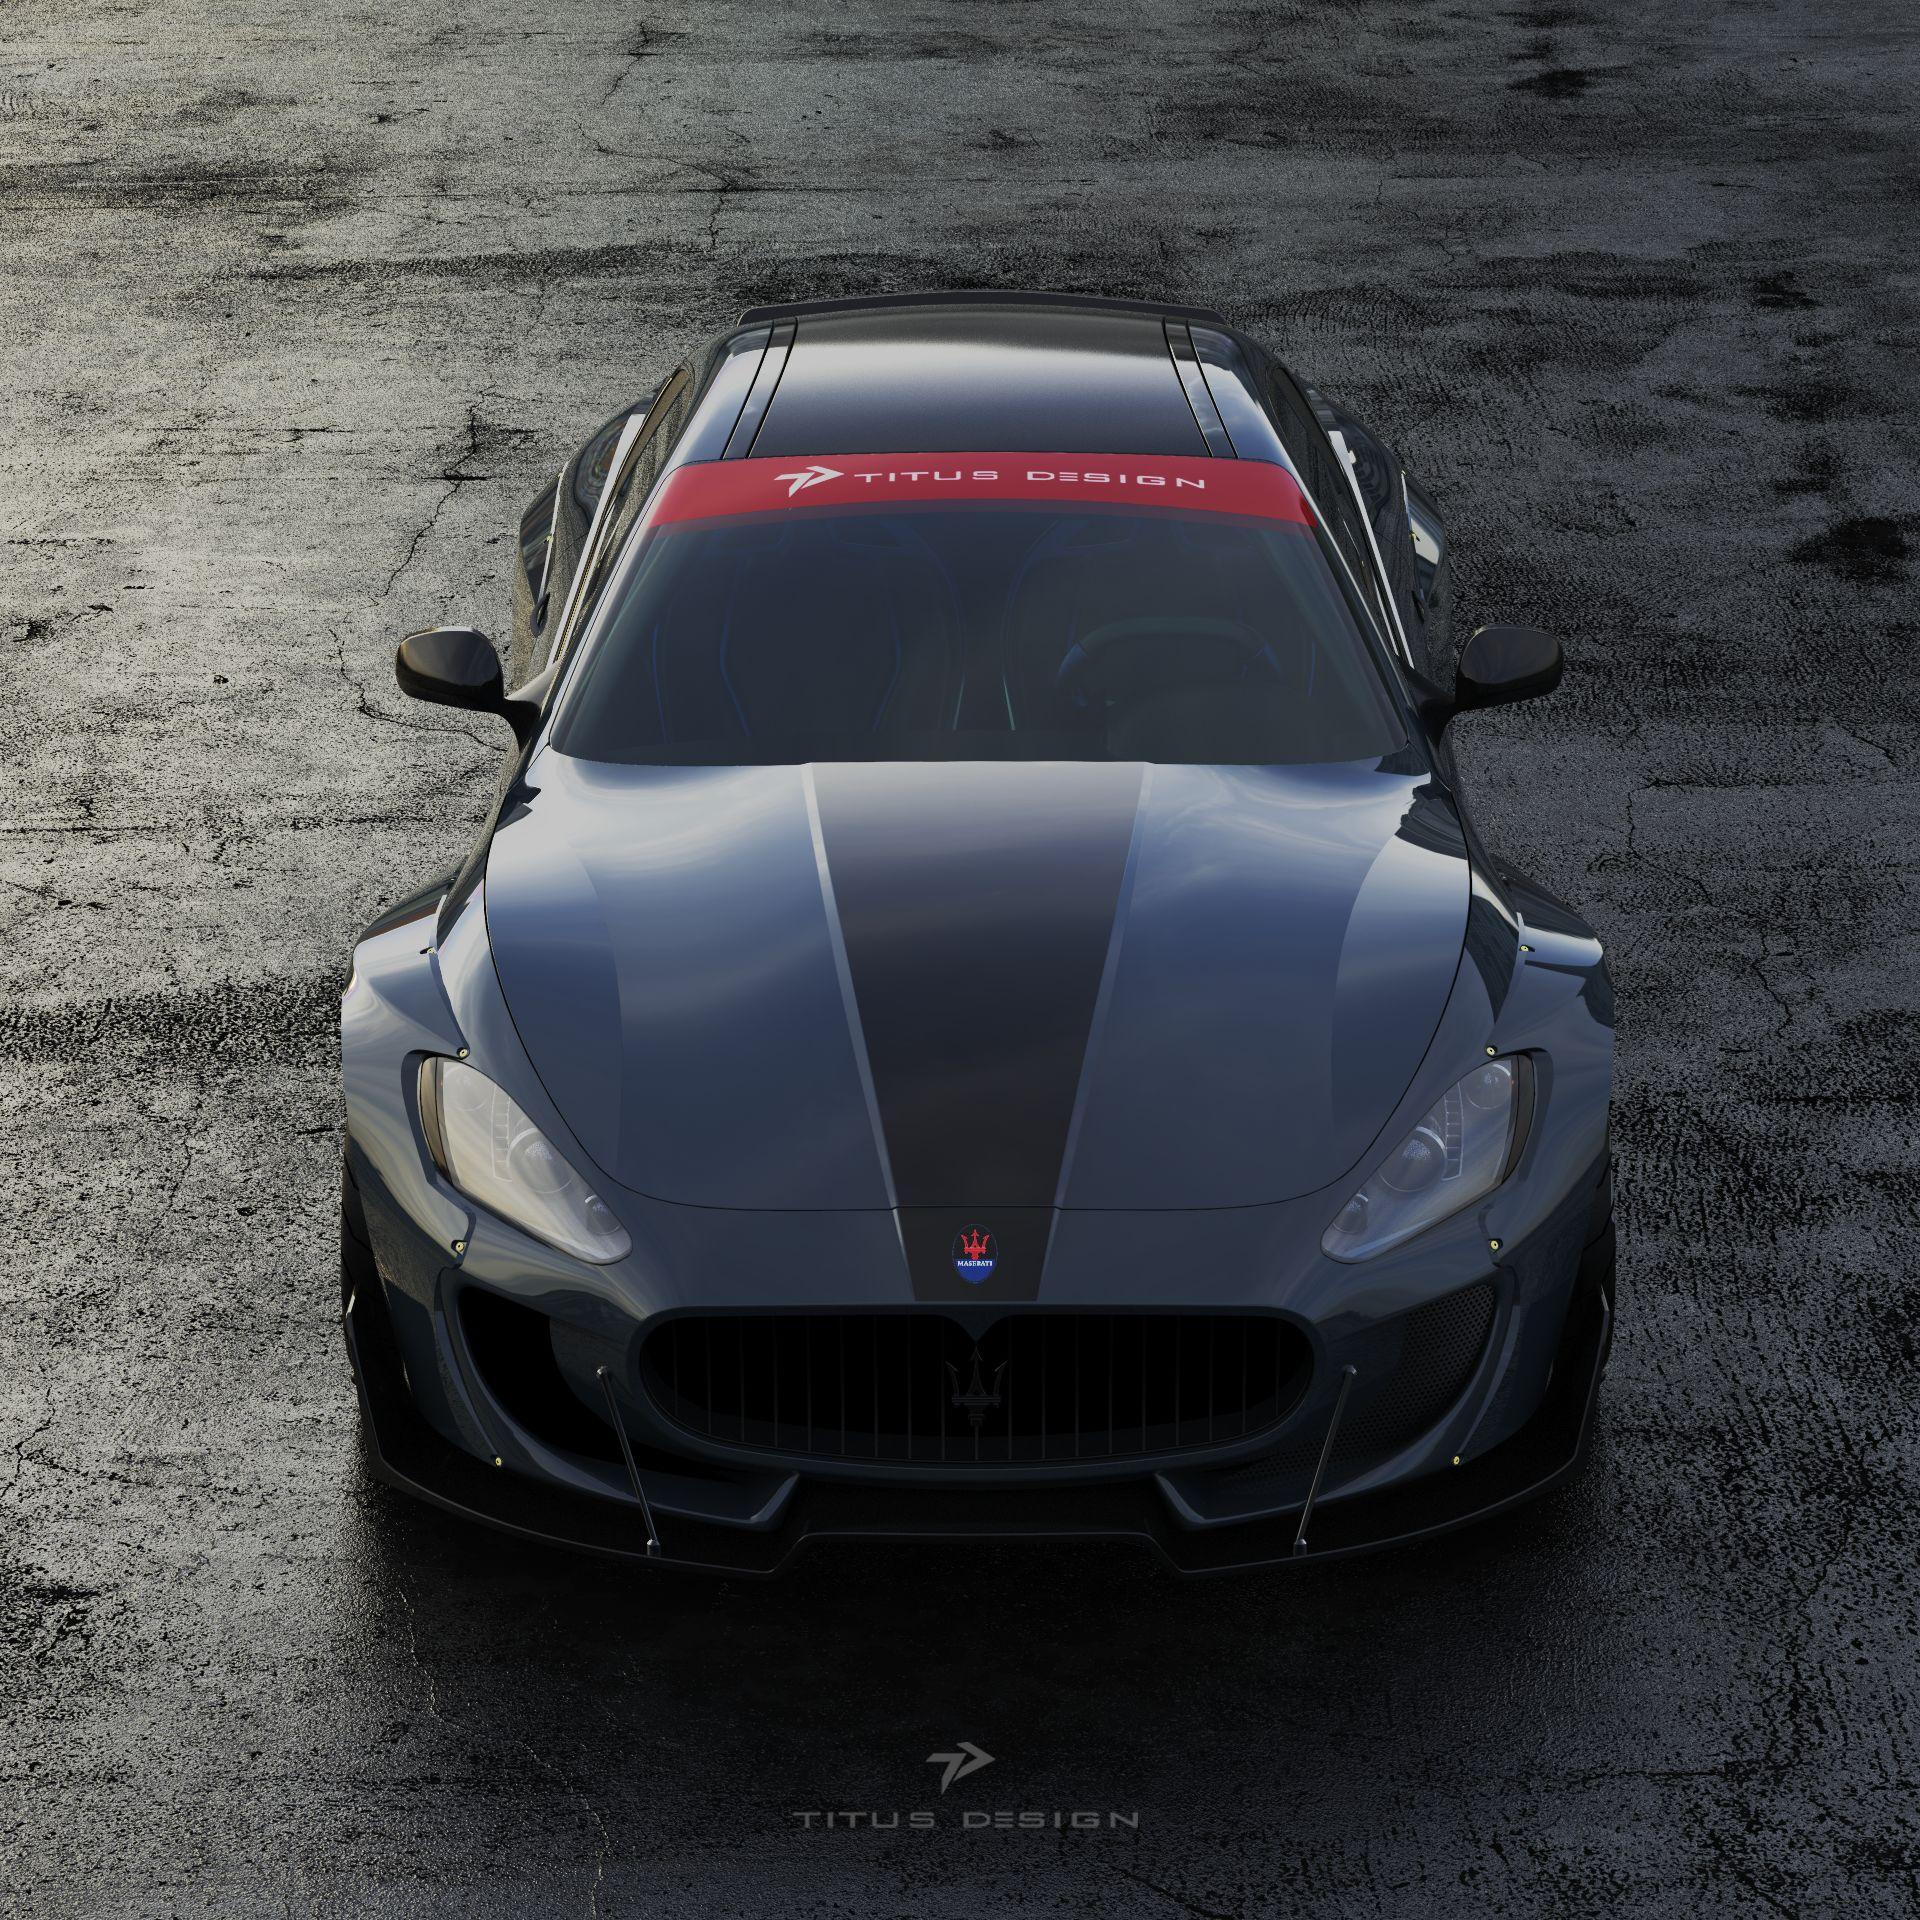 Maserati-gt-16-8-3500-3500